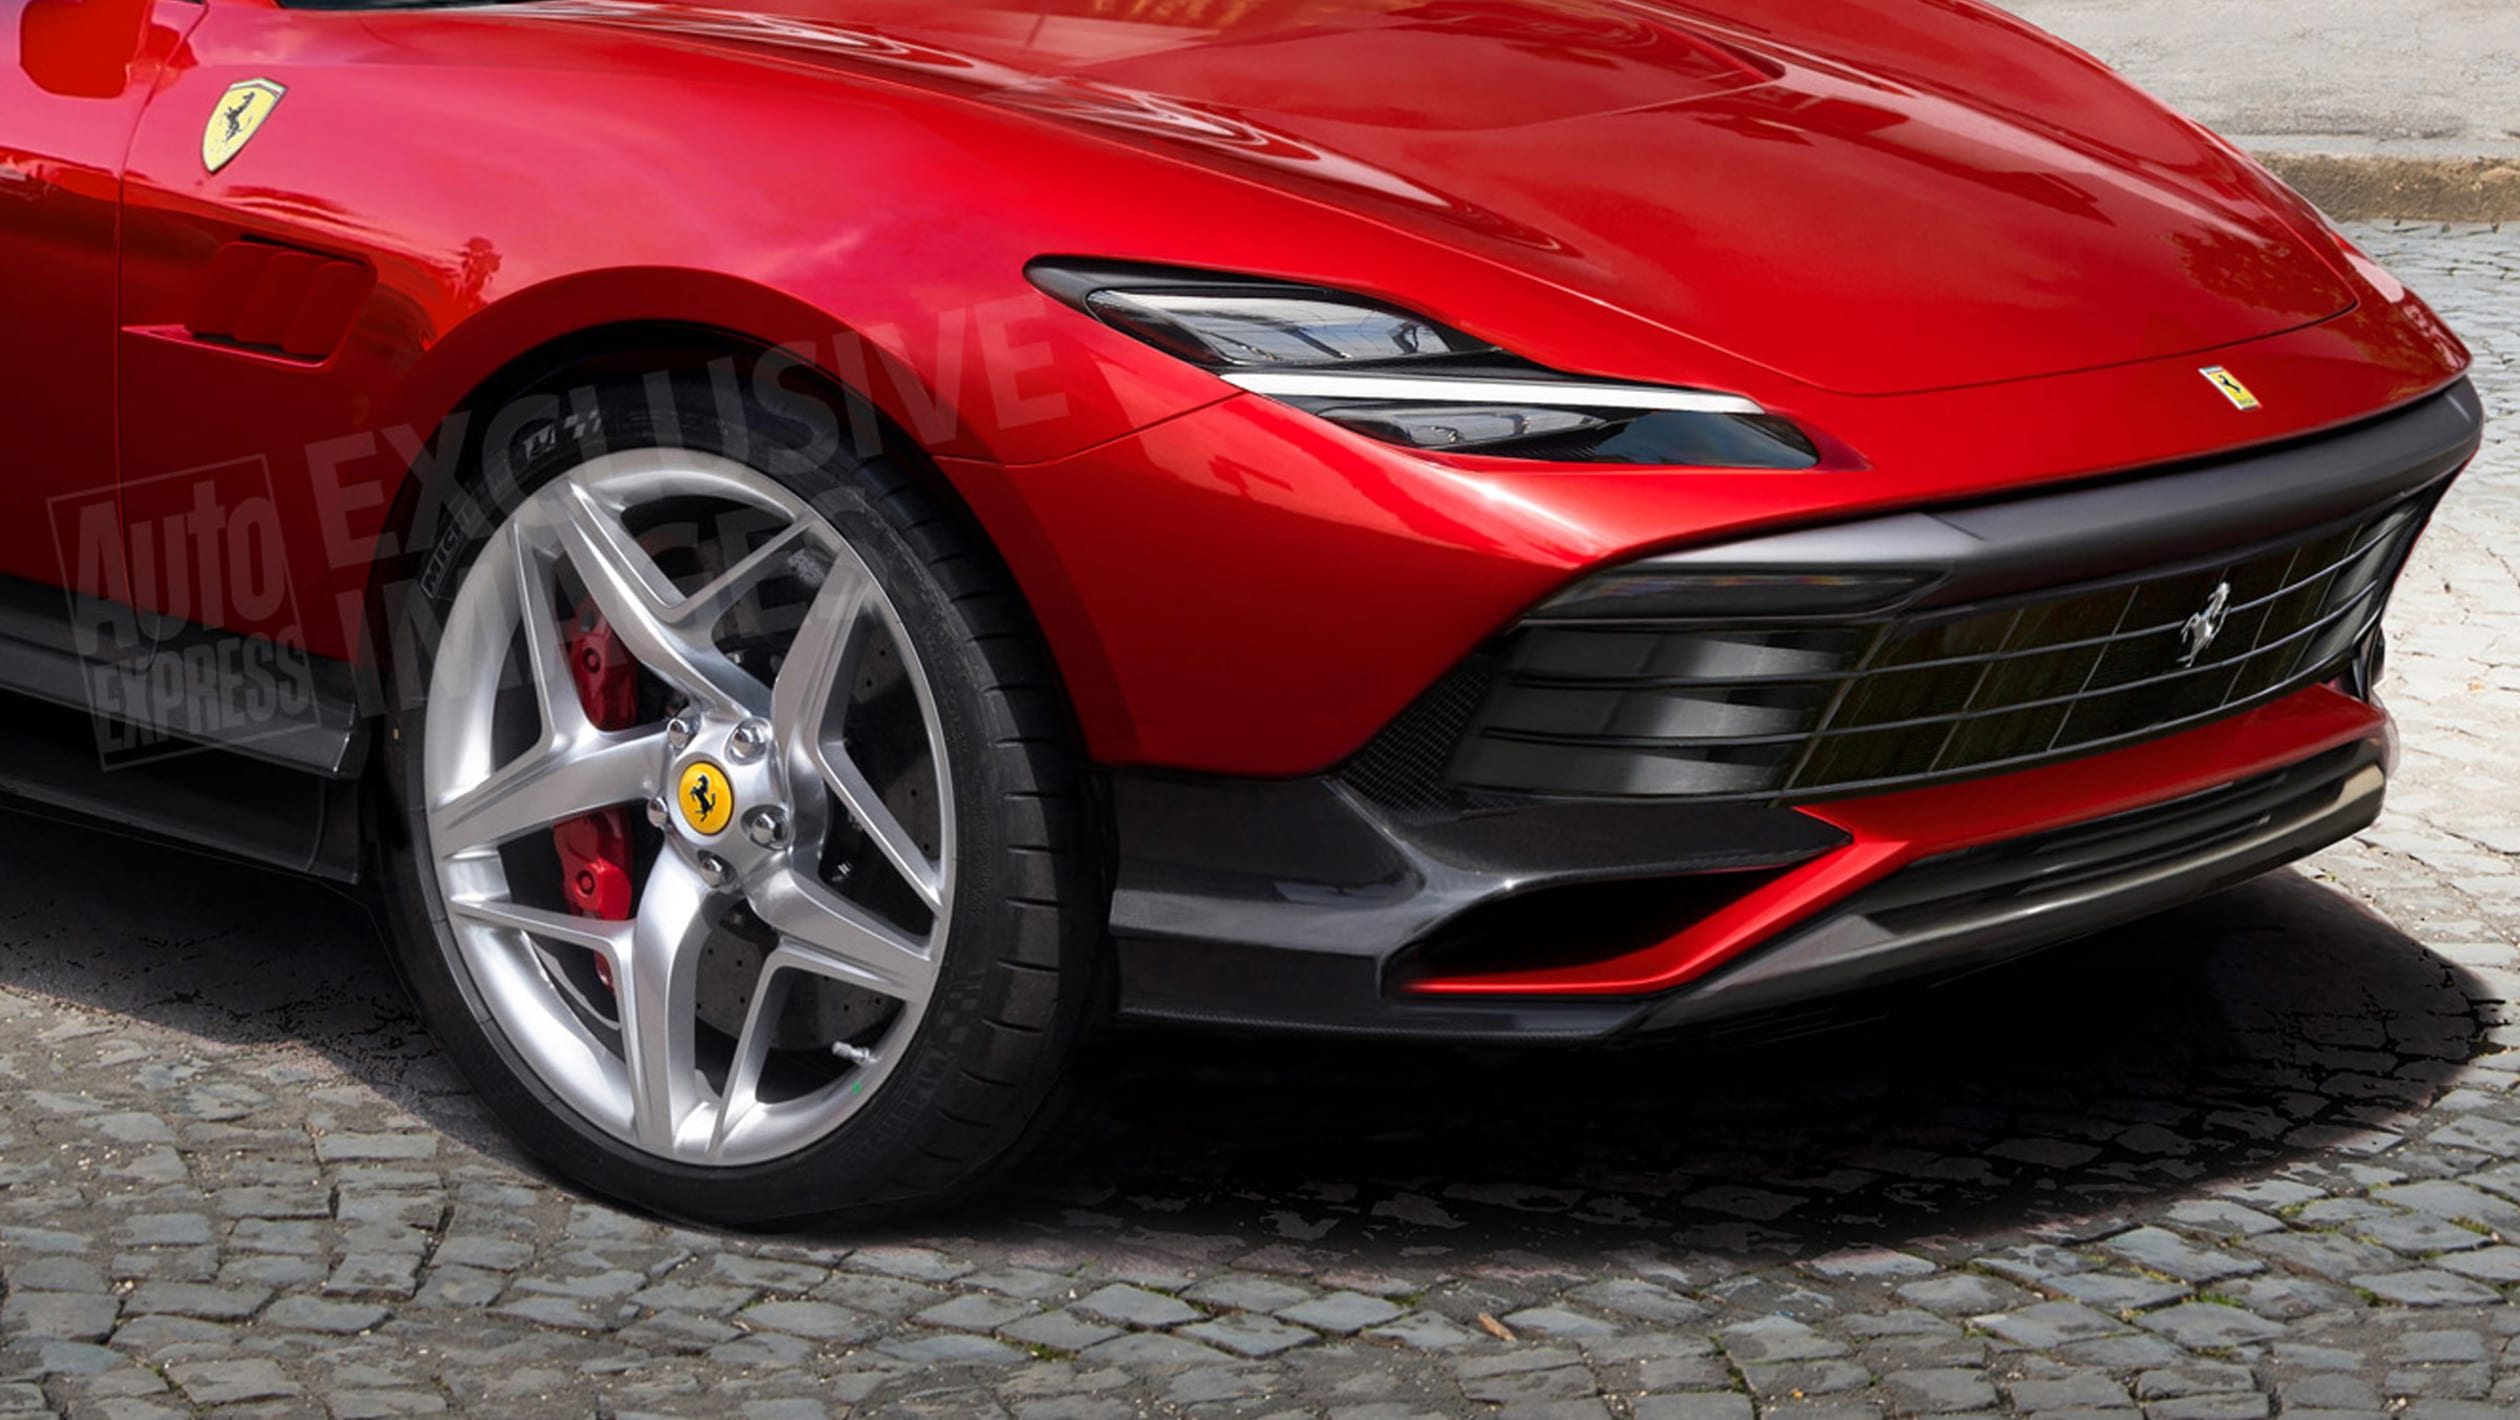 Ferrari Purosangue Suv Ferrari S First Fuv Bleeding Edge Digital